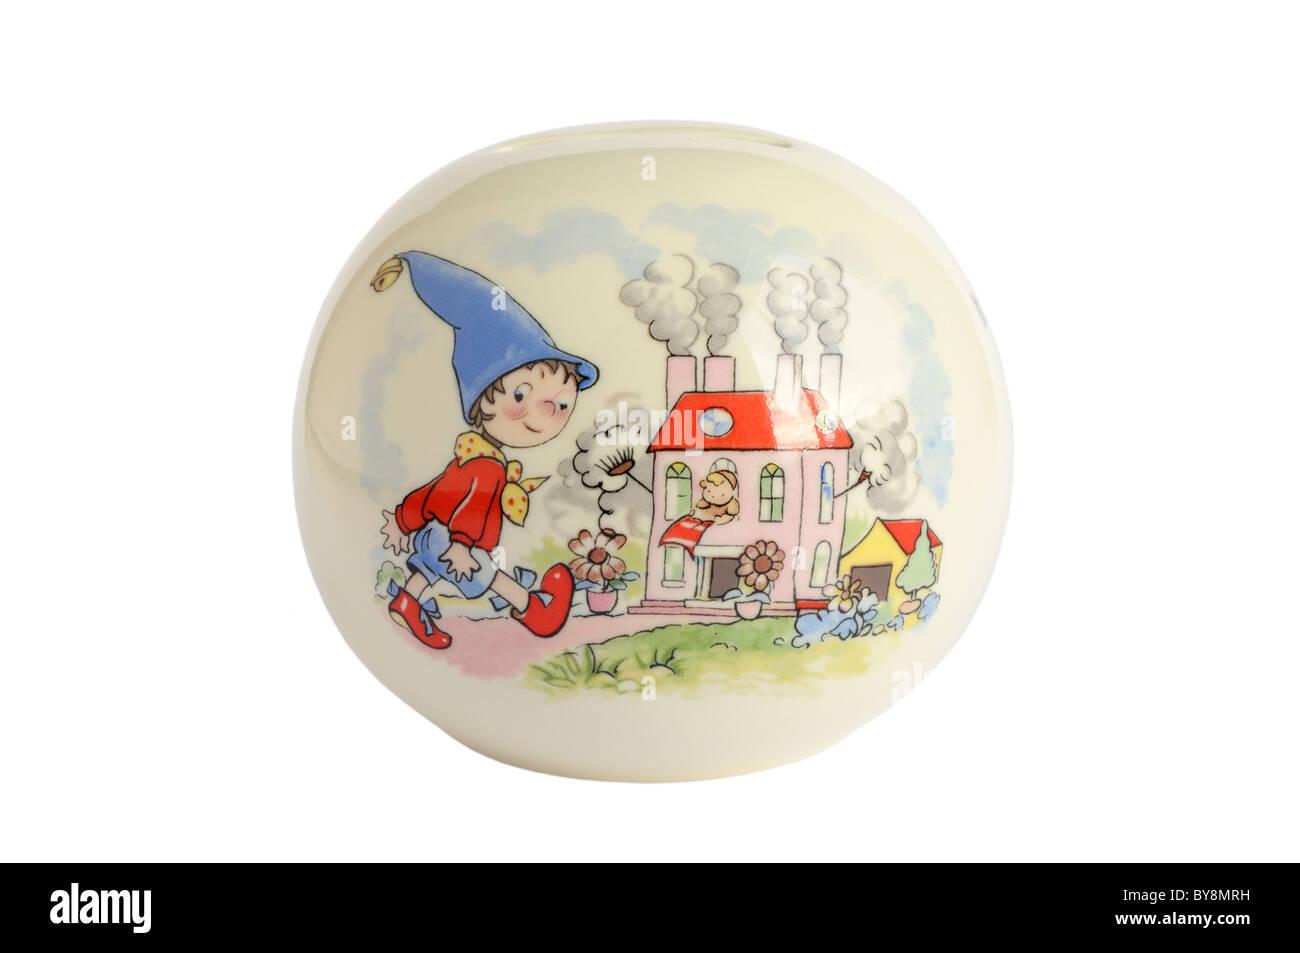 Noddy money box - Stock Image